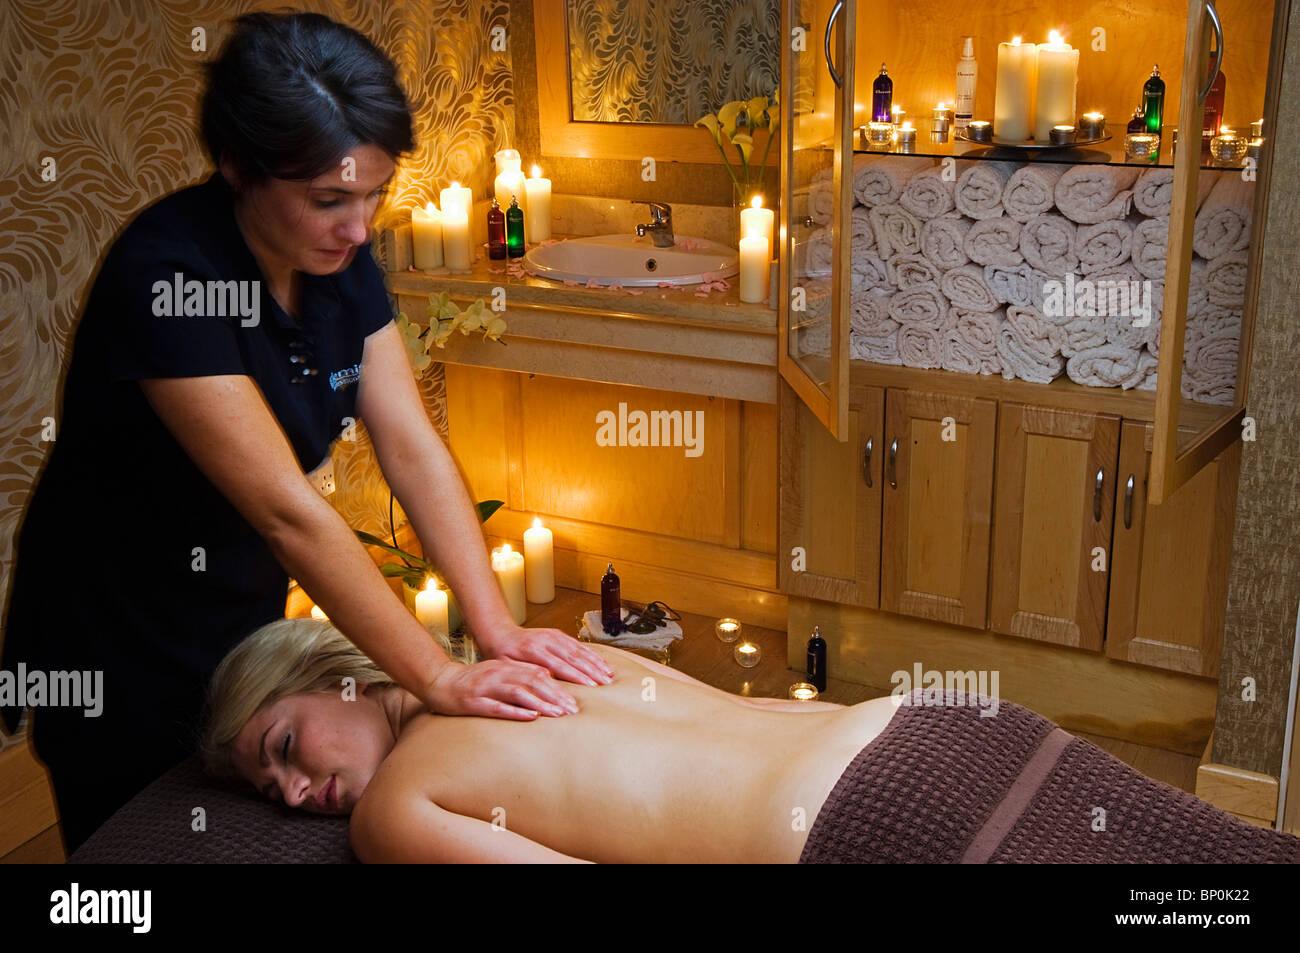 northern ireland, fermanagh, enniskillen. a girl enjoys a massage in